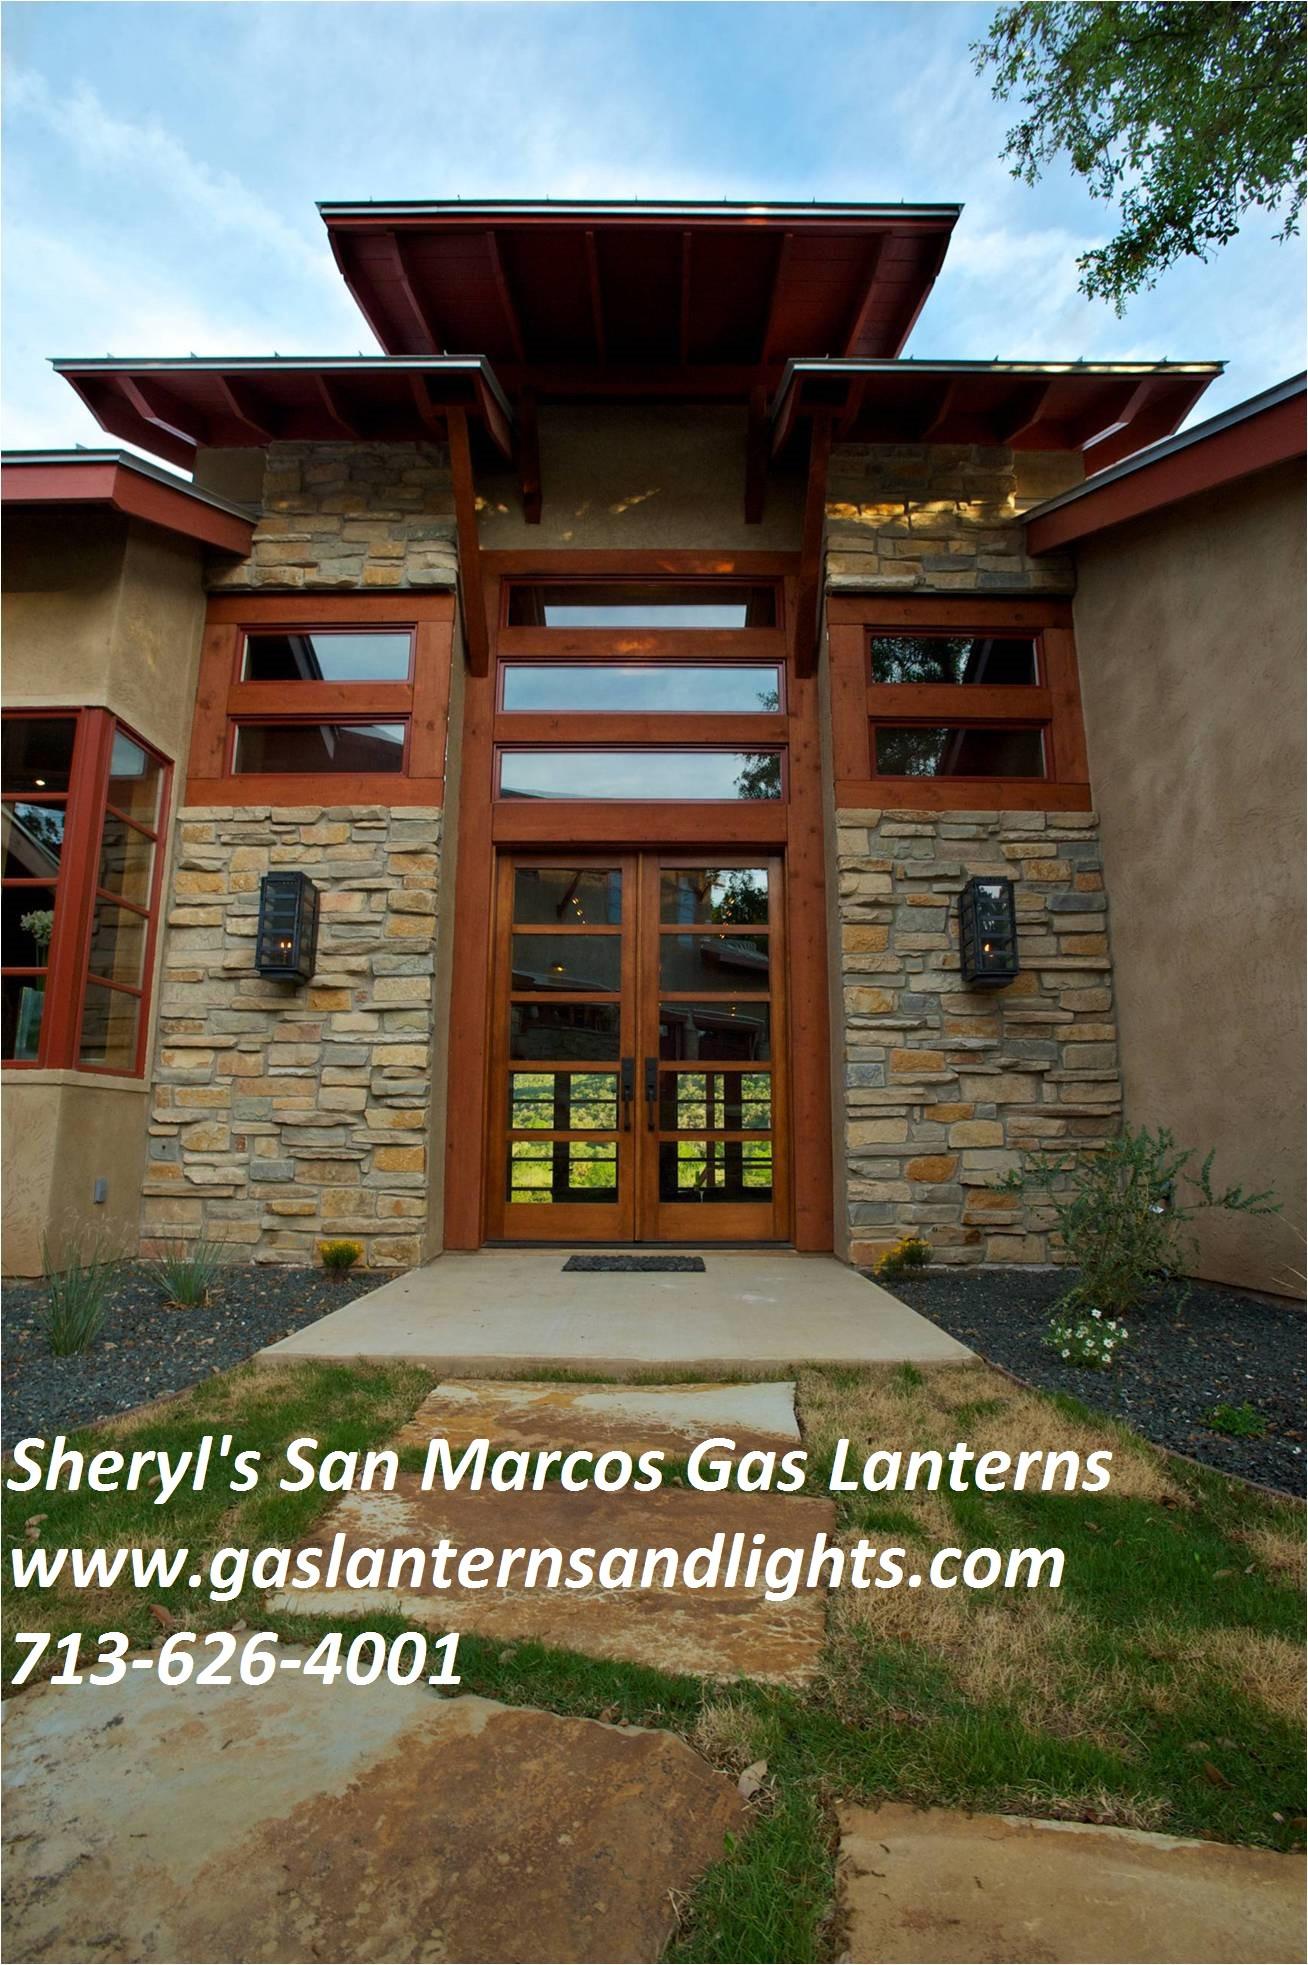 Contemporary San Marcos Gas Lanterns by Sheryl Stringer